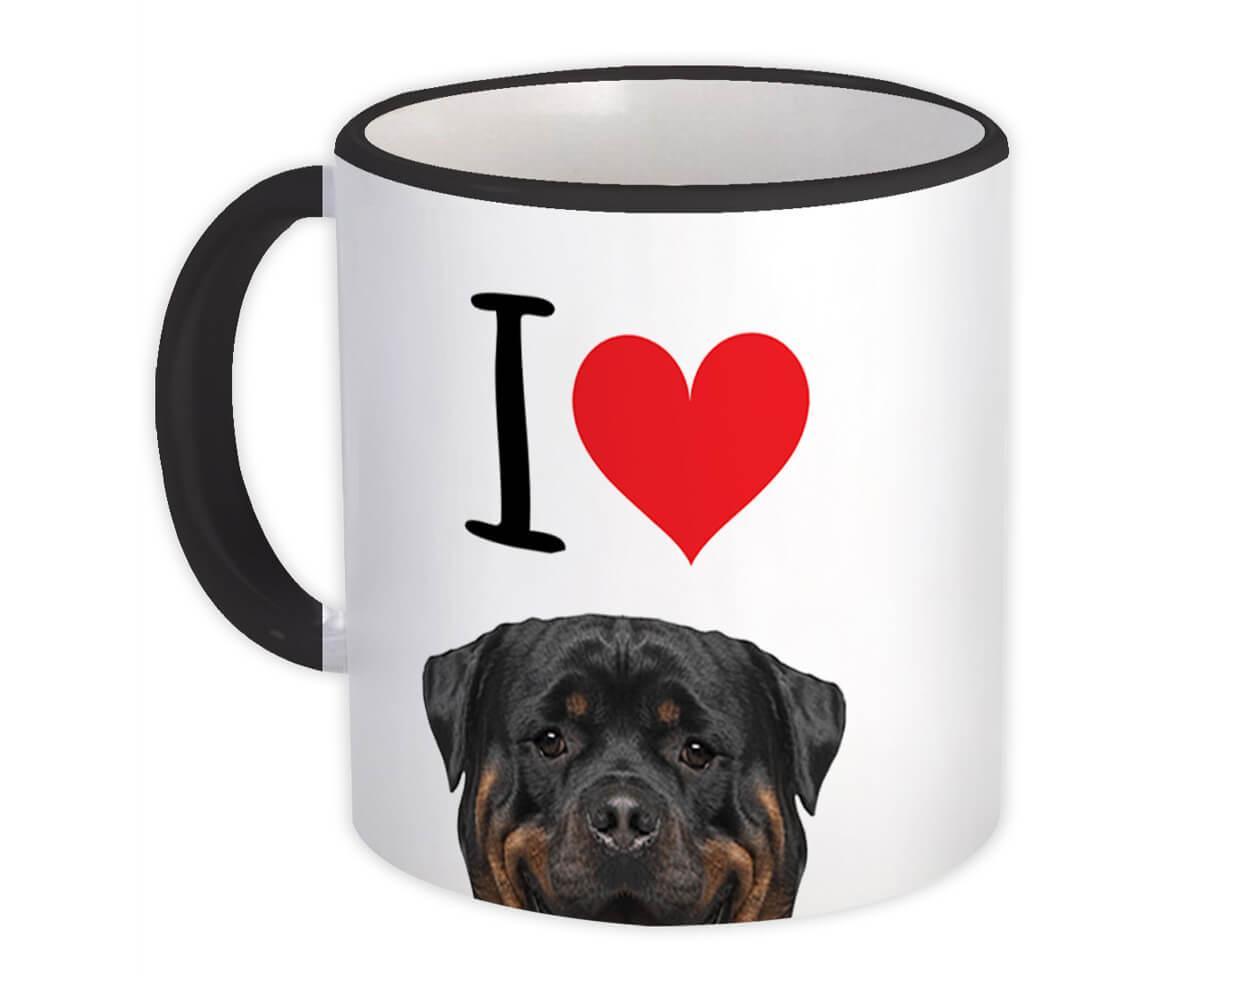 I Love Rottweiler : Gift Mug Dog Lover Funny Owner Heart Cute Pet Mom Dad